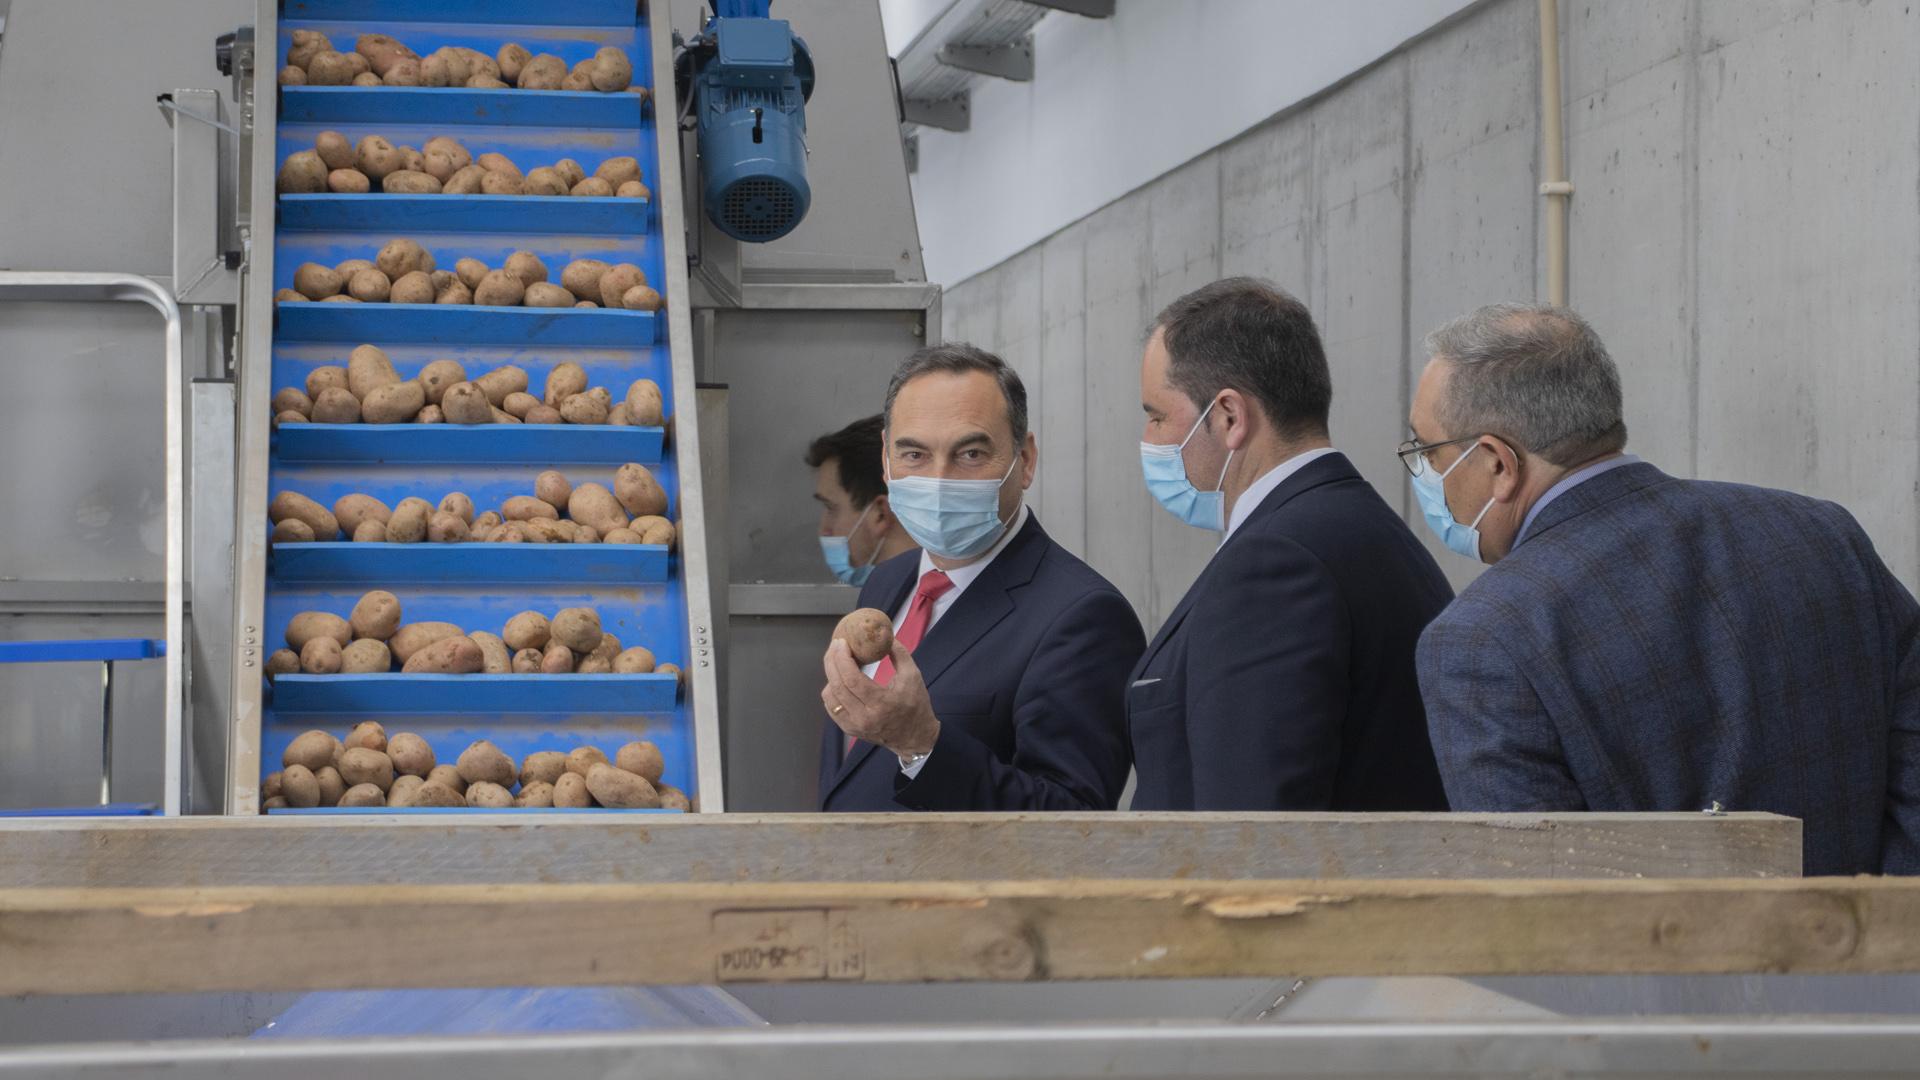 visita à Frutercoop - Cooperativa de Hortofruticultores da Ilha Terceira